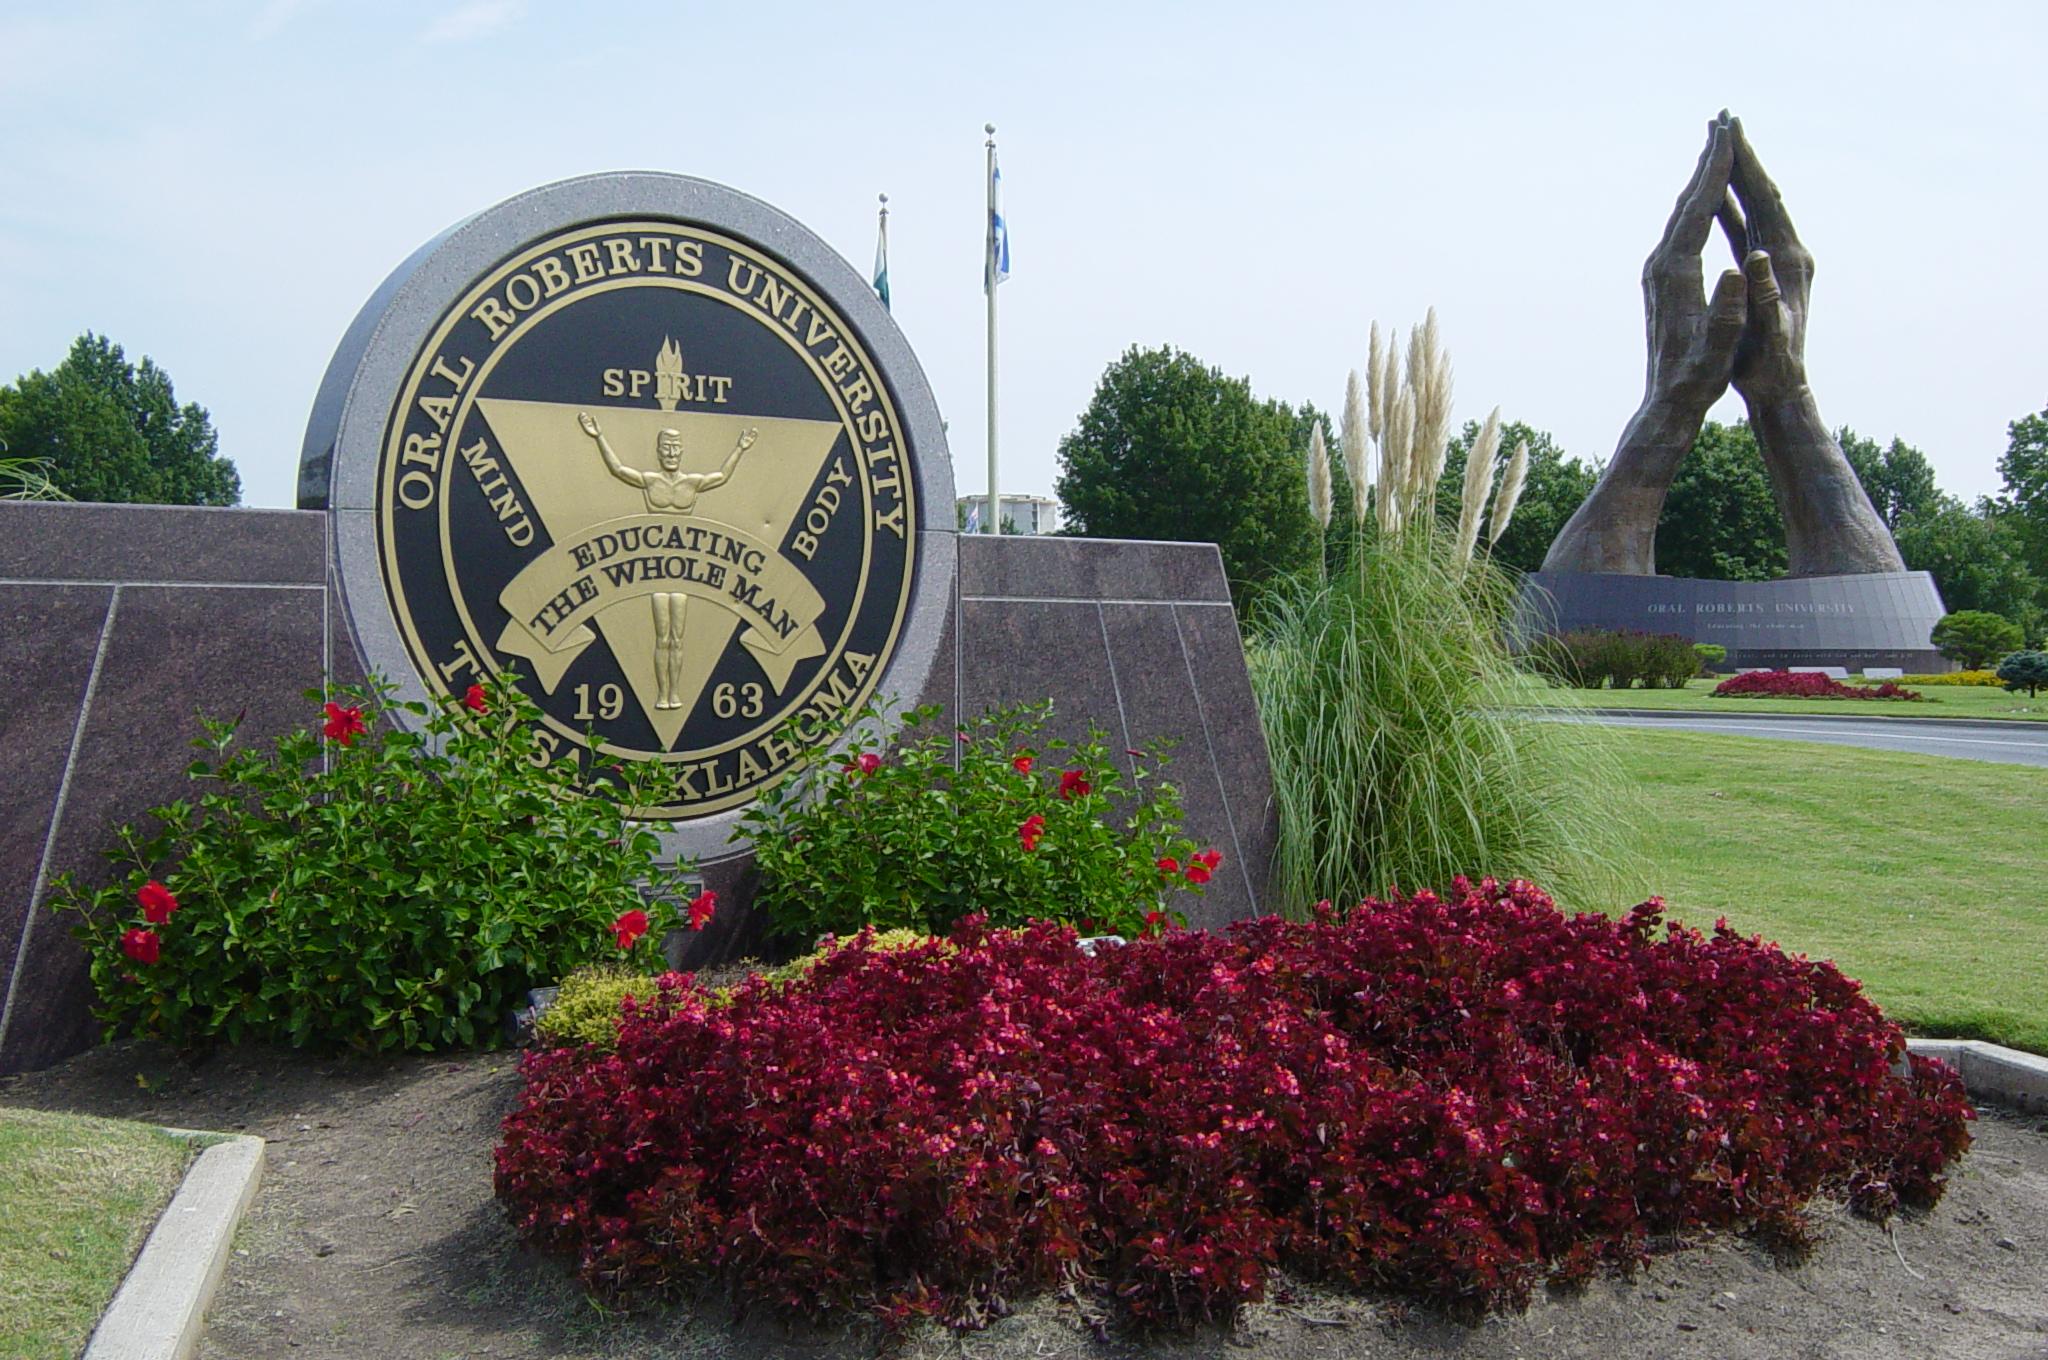 Oral Roberts Univ 52